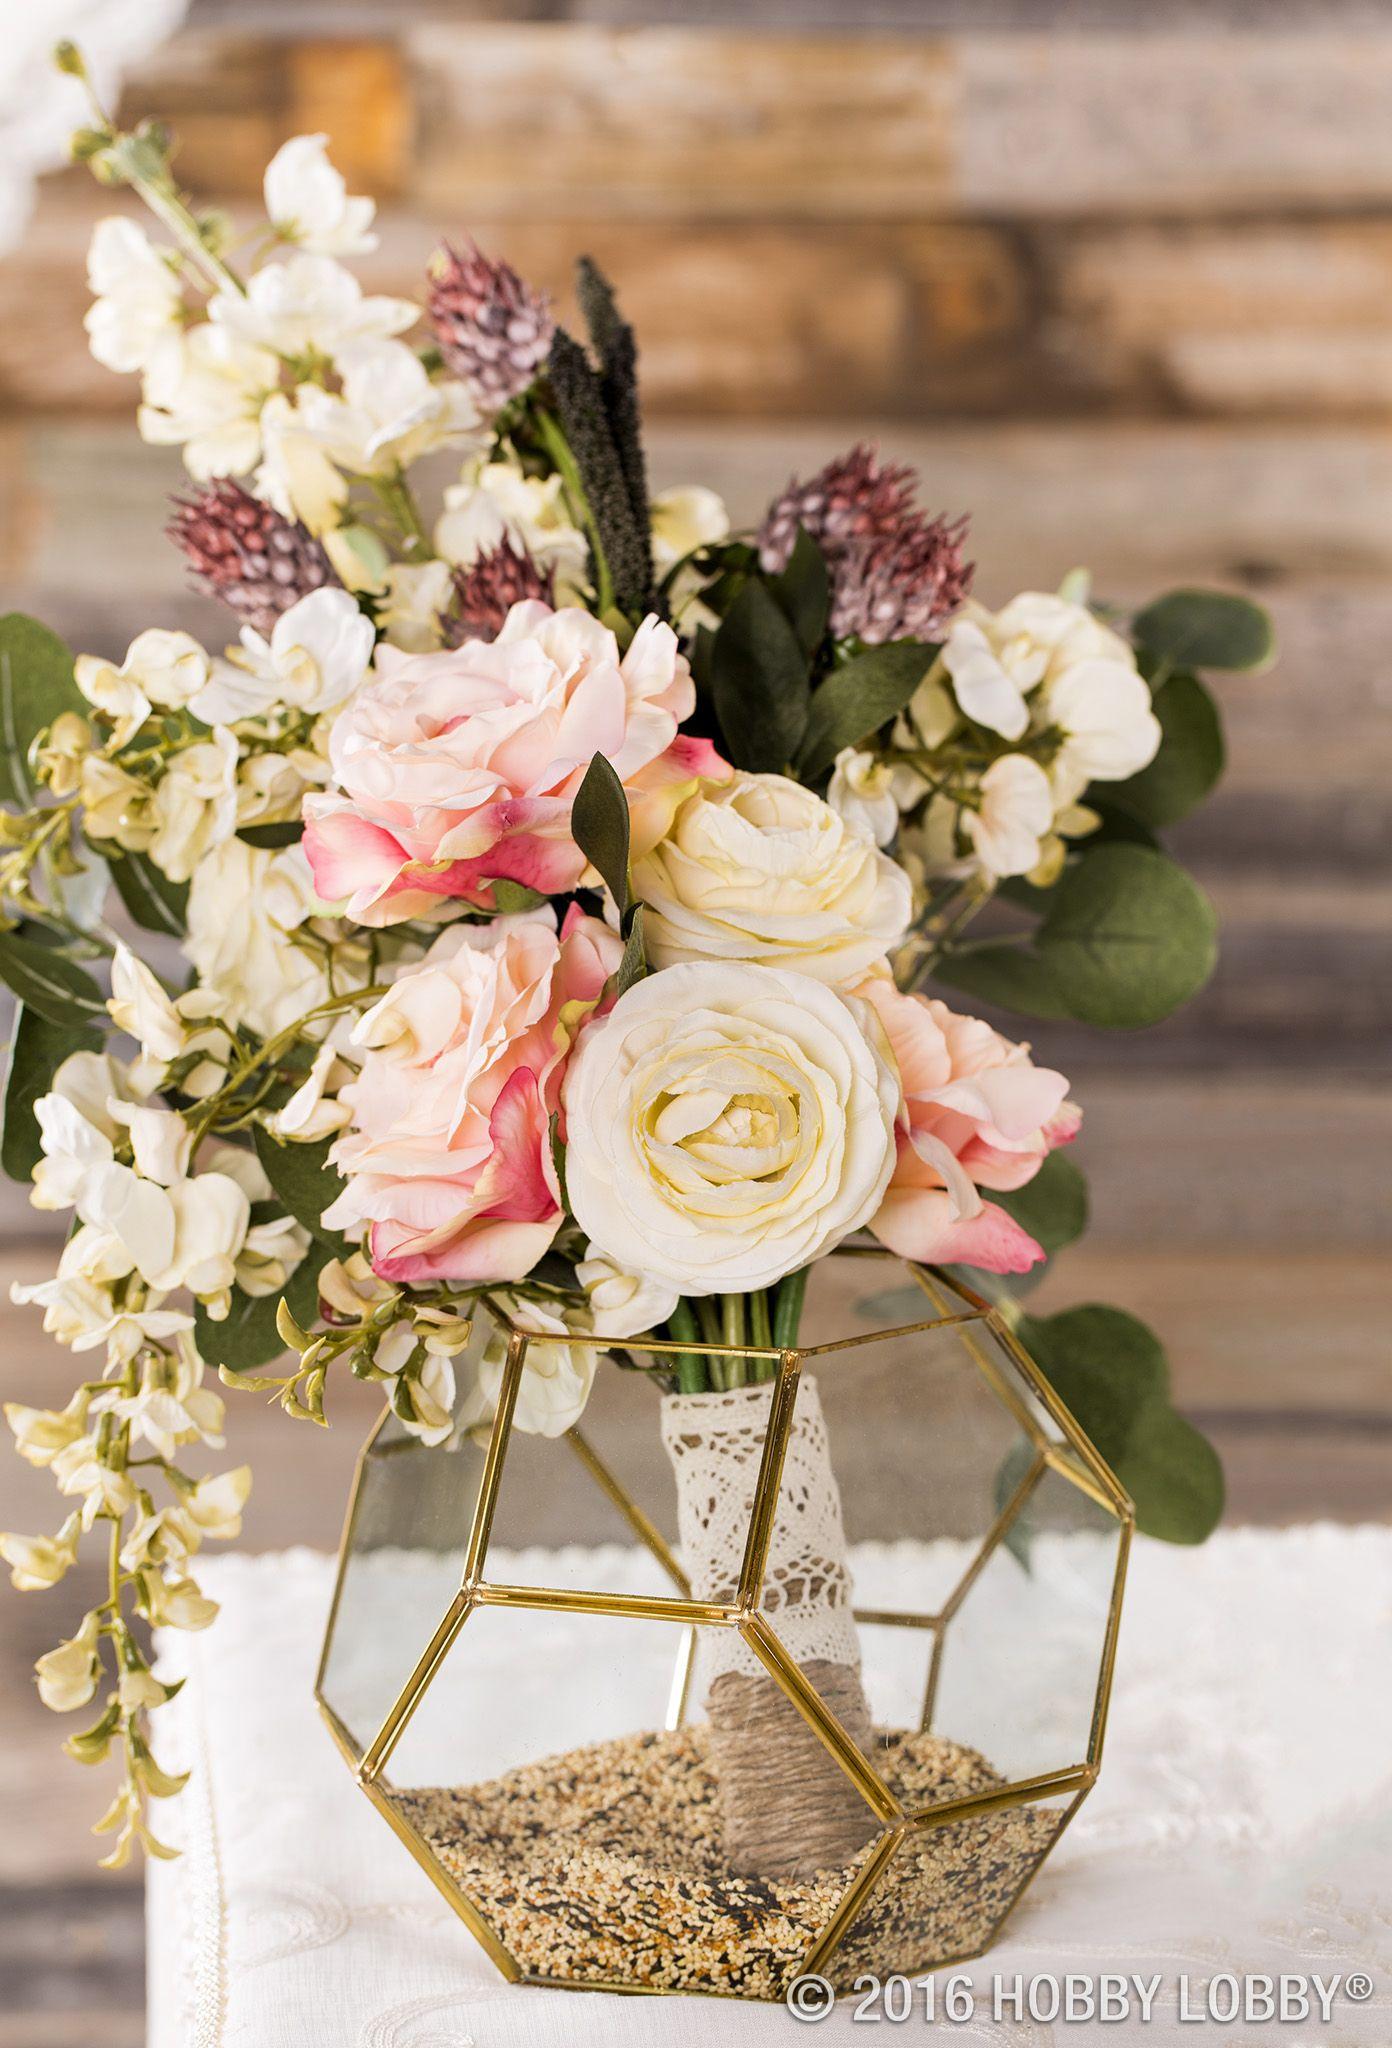 Wedding Floral Wedding Hobby Lobby Flower Centerpieces Wedding Floral Wedding Teal Wedding Centerpieces